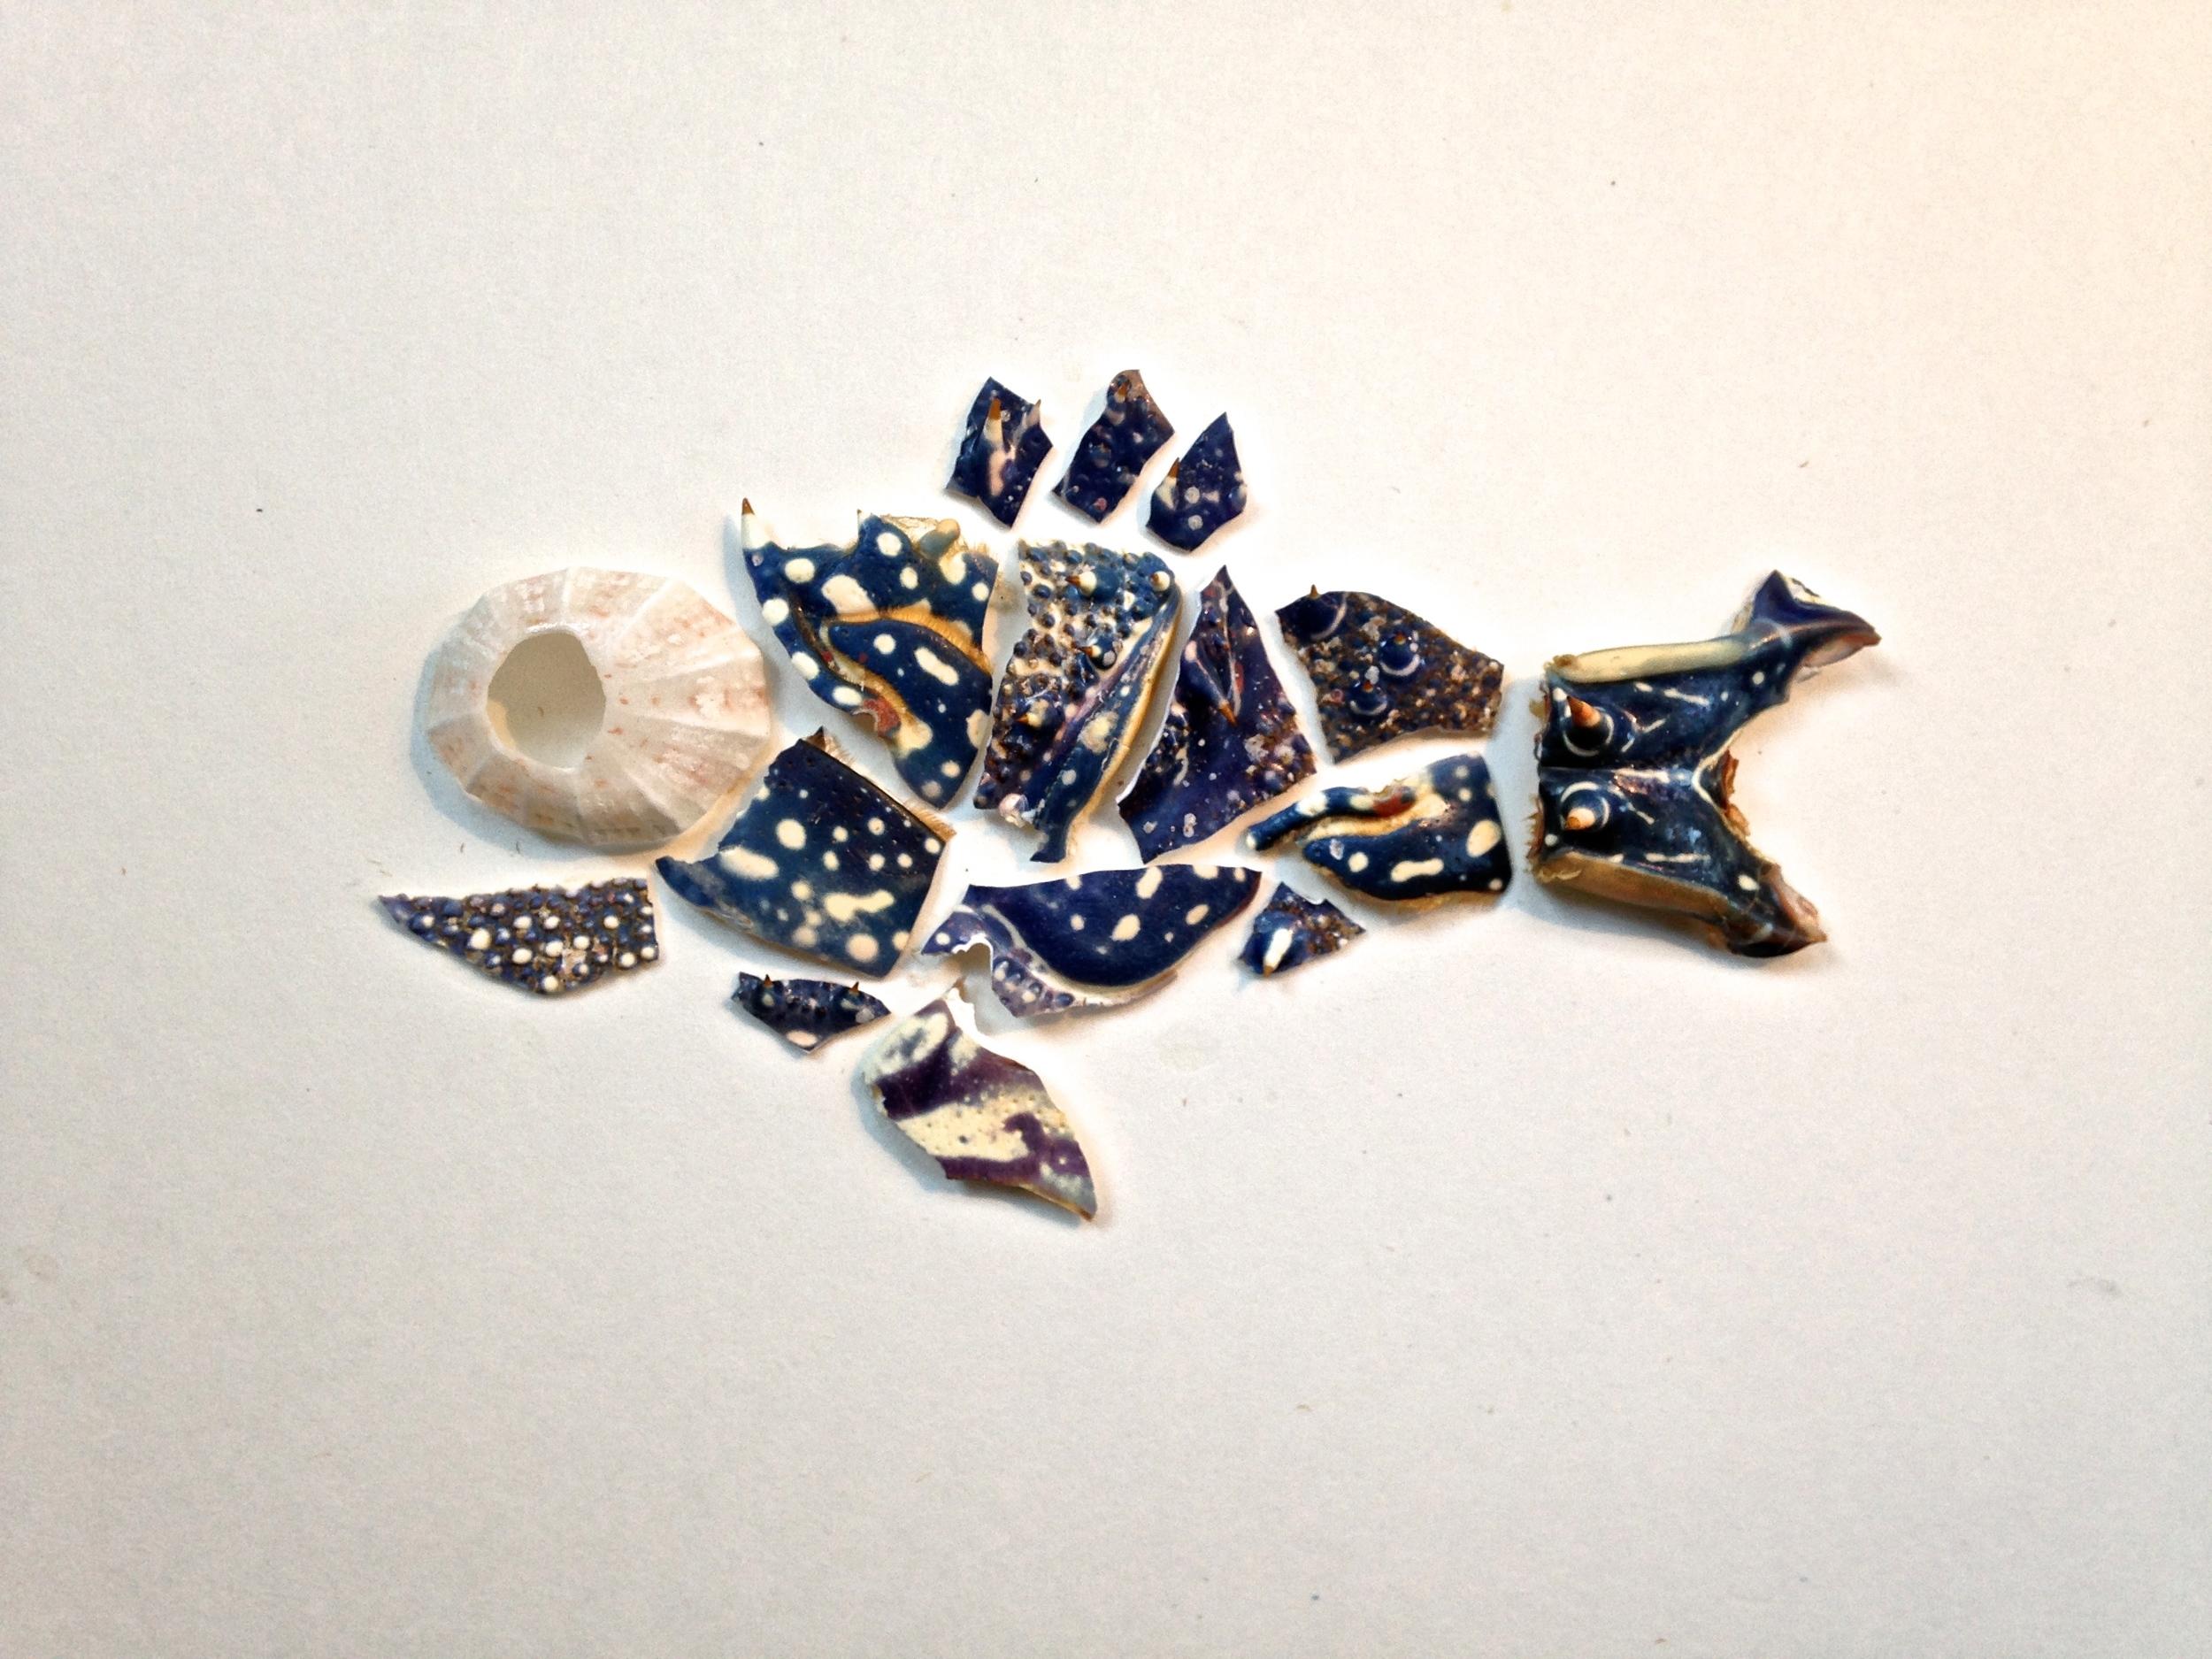 Fish fella from Caribbean lobster shell and barnacle (Barbuda)